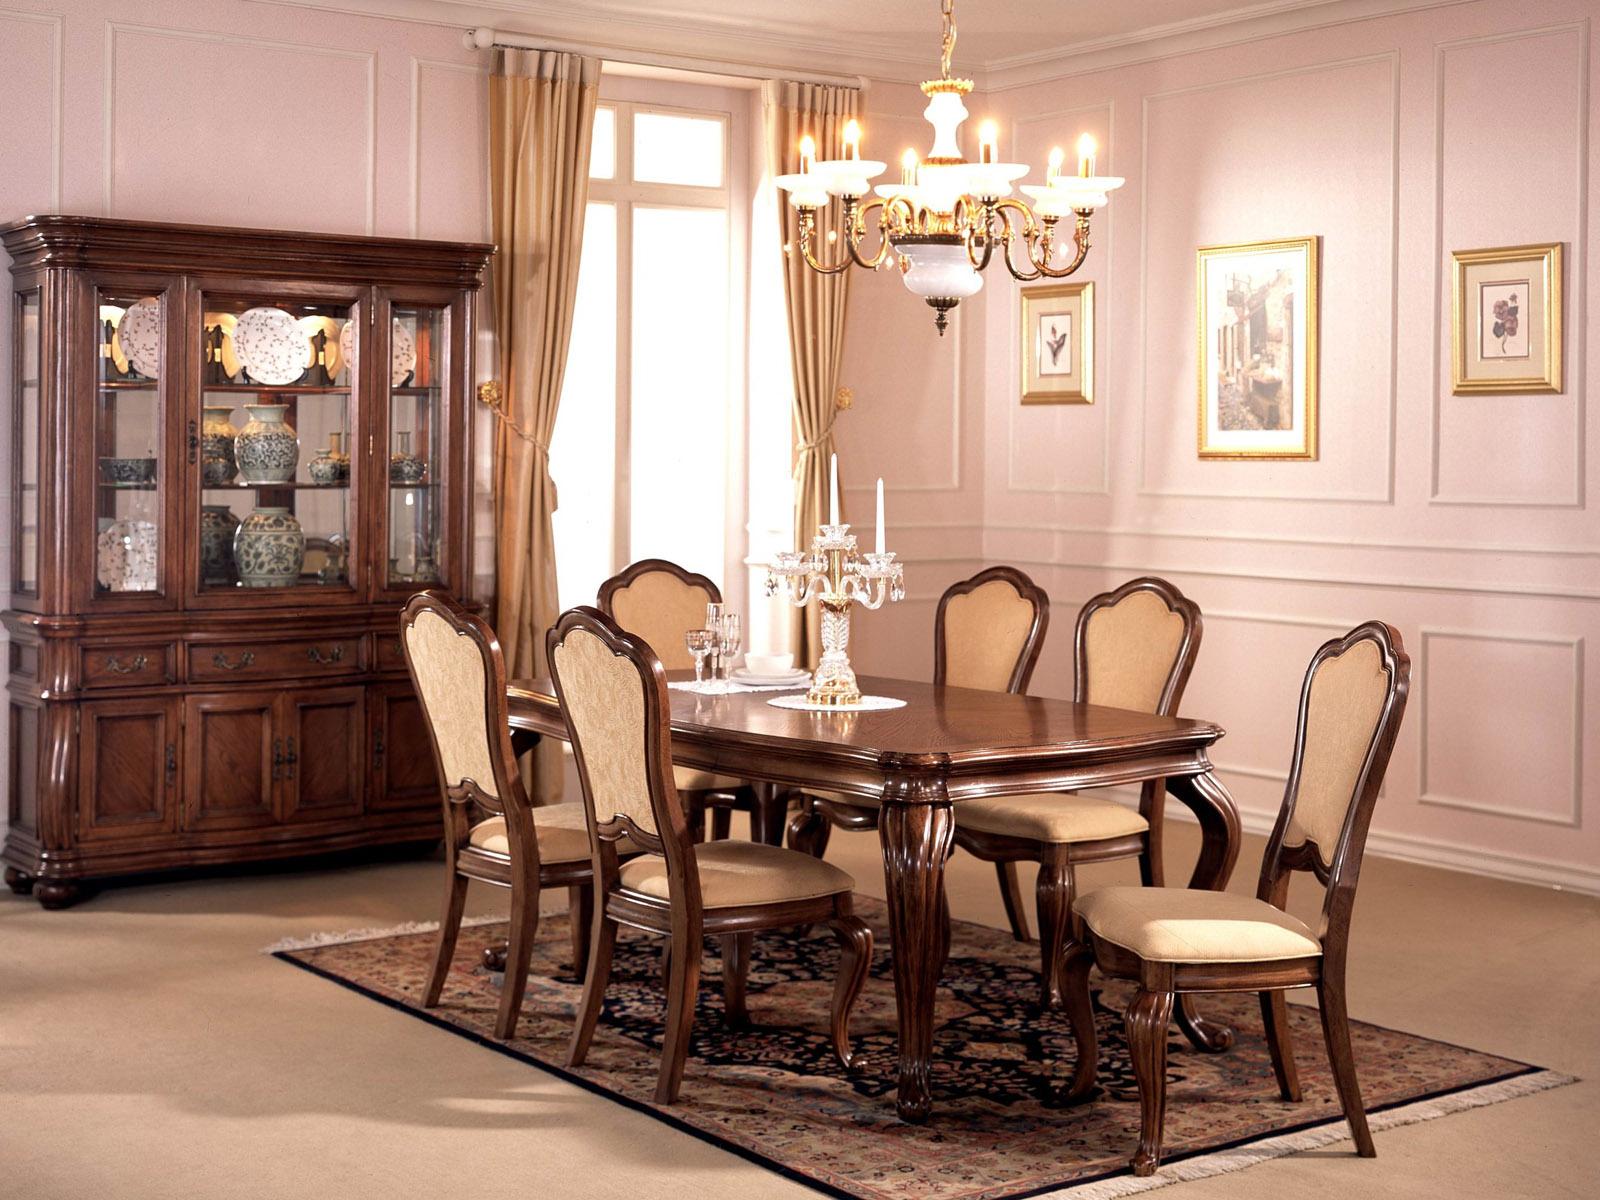 modern dining room decoration idea